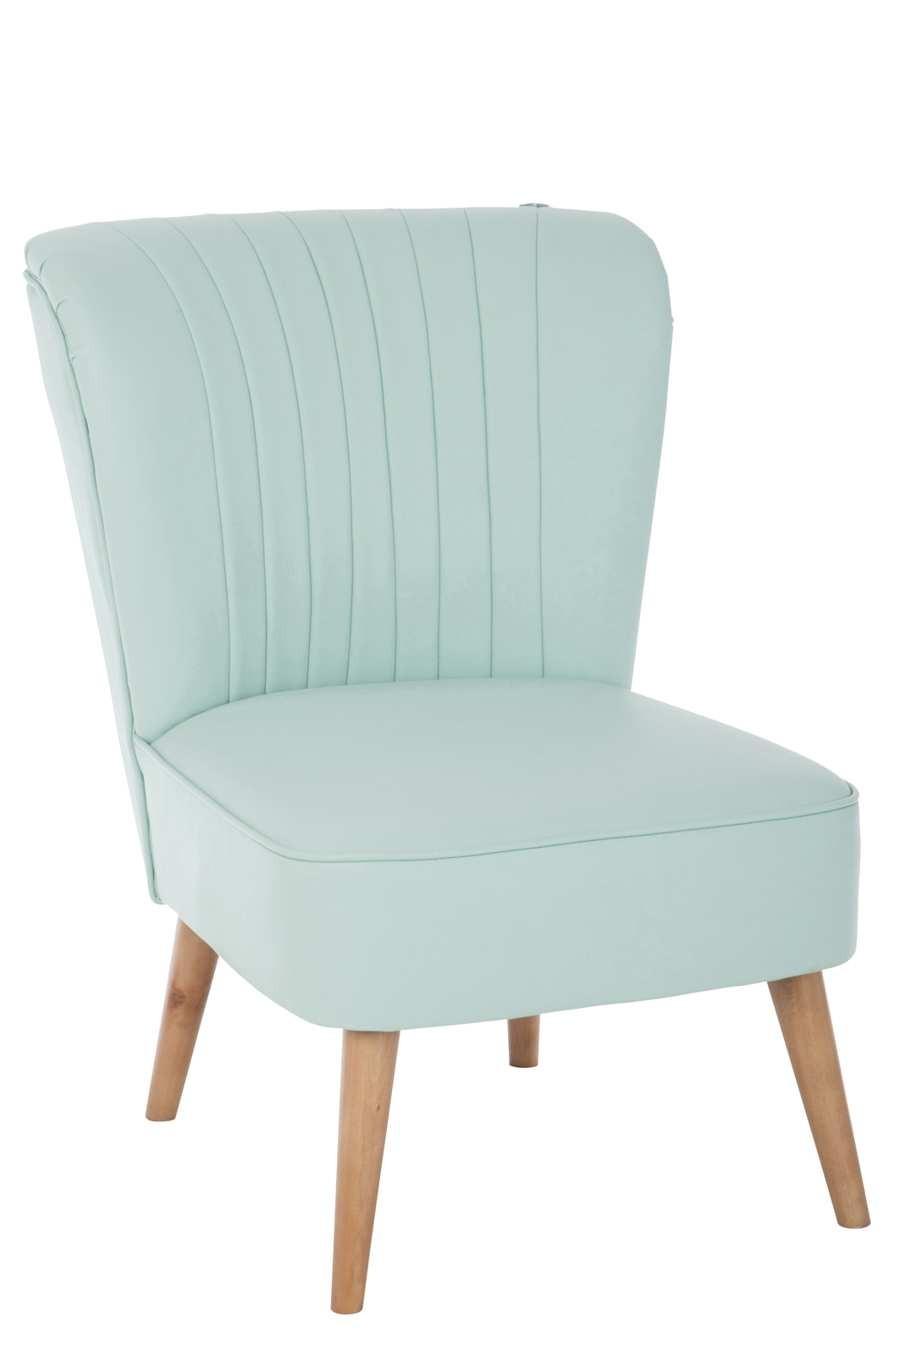 fauteuil cocktail scandinave Vert 53X68X78Cm J-Line by Jolipa 22143